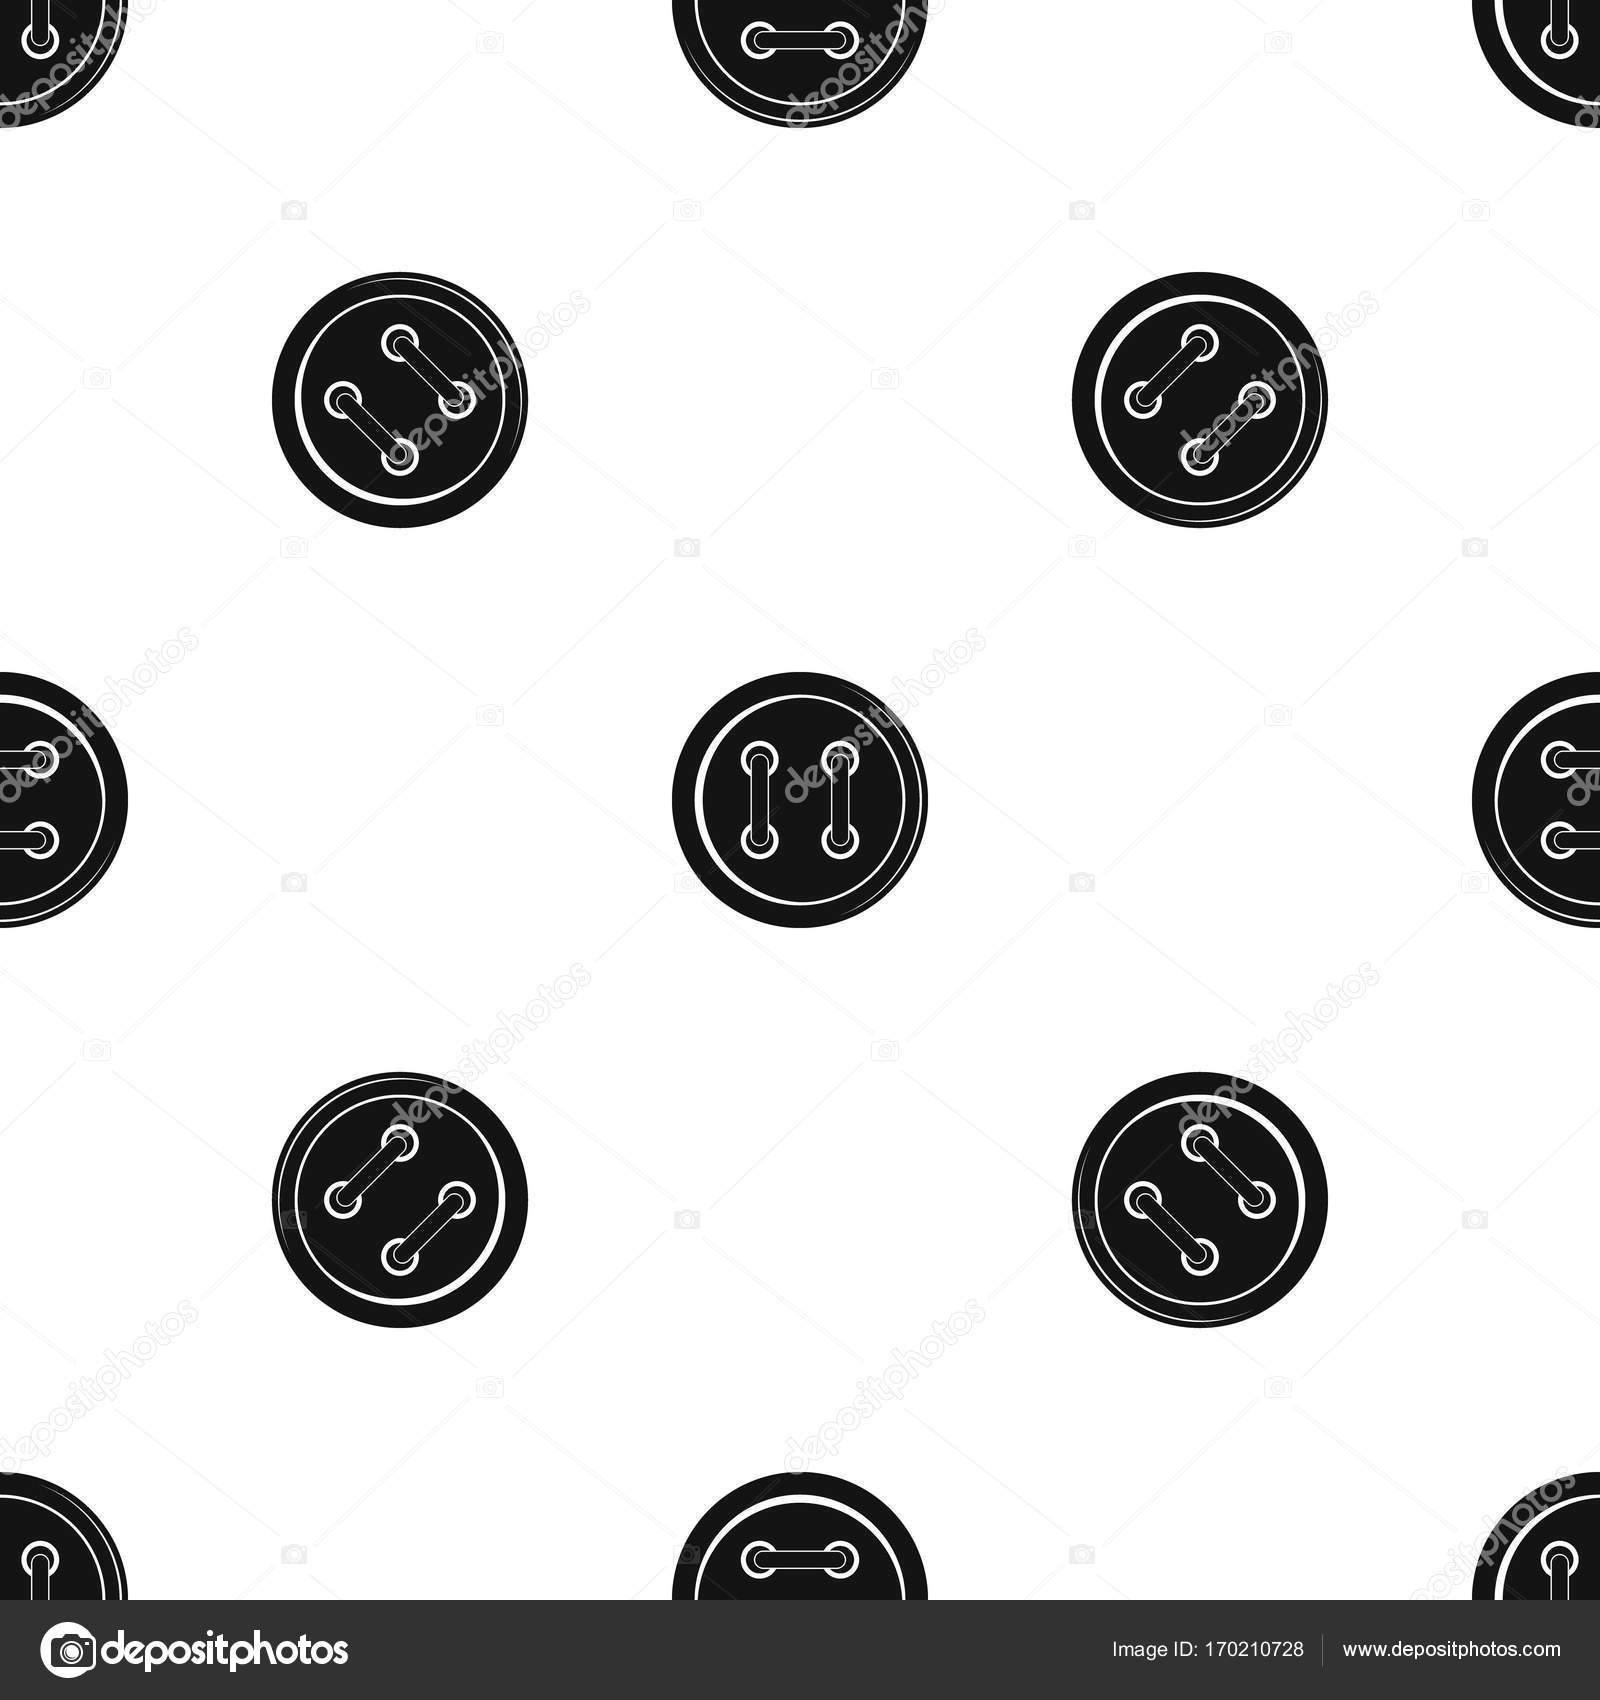 Nähen-Taste Muster nahtlos schwarz — Stockvektor © ylivdesign #170210728